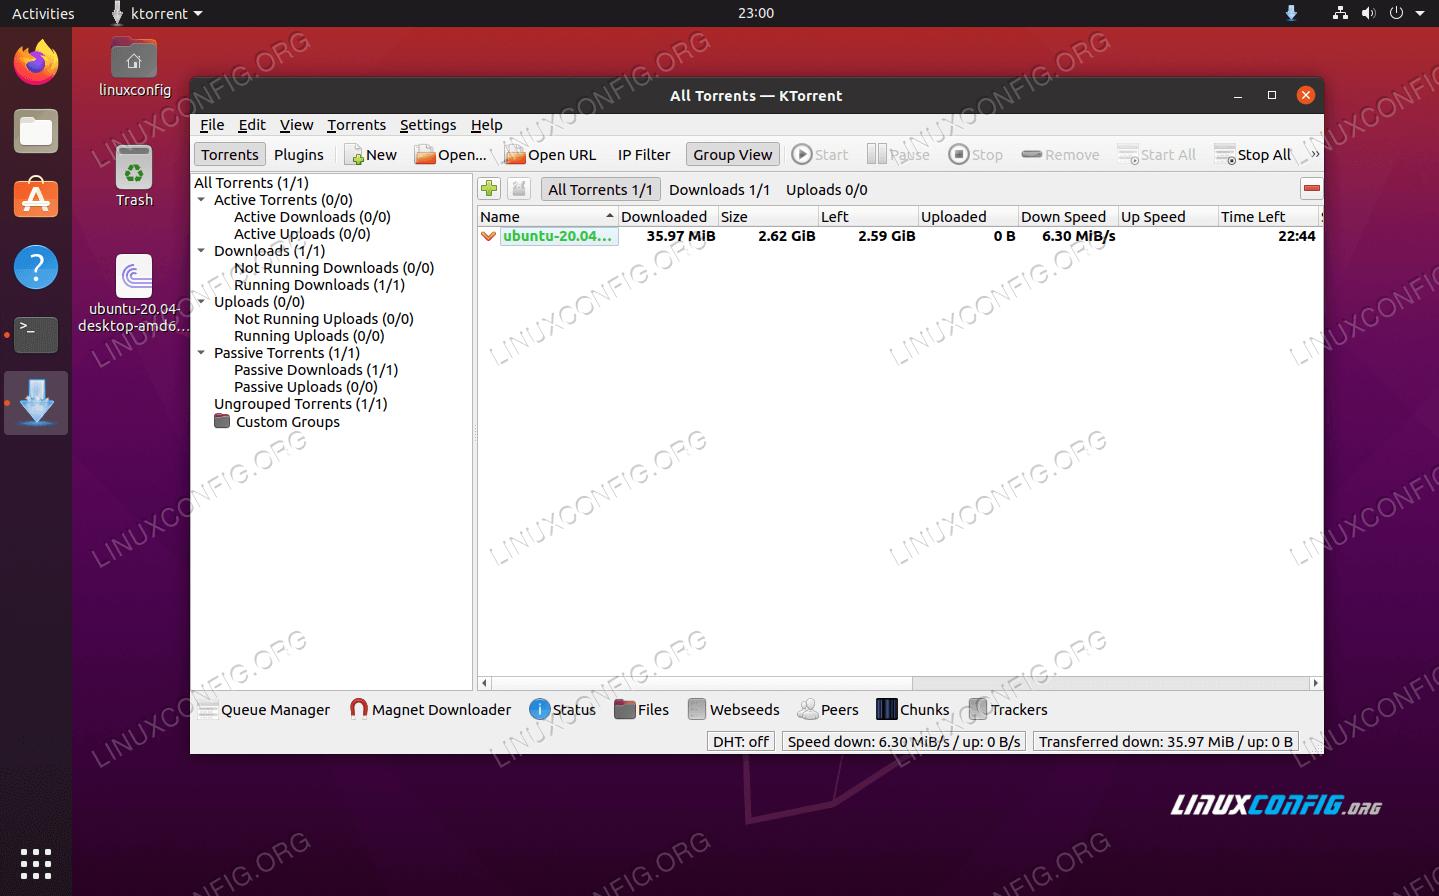 KTorrent torrent client